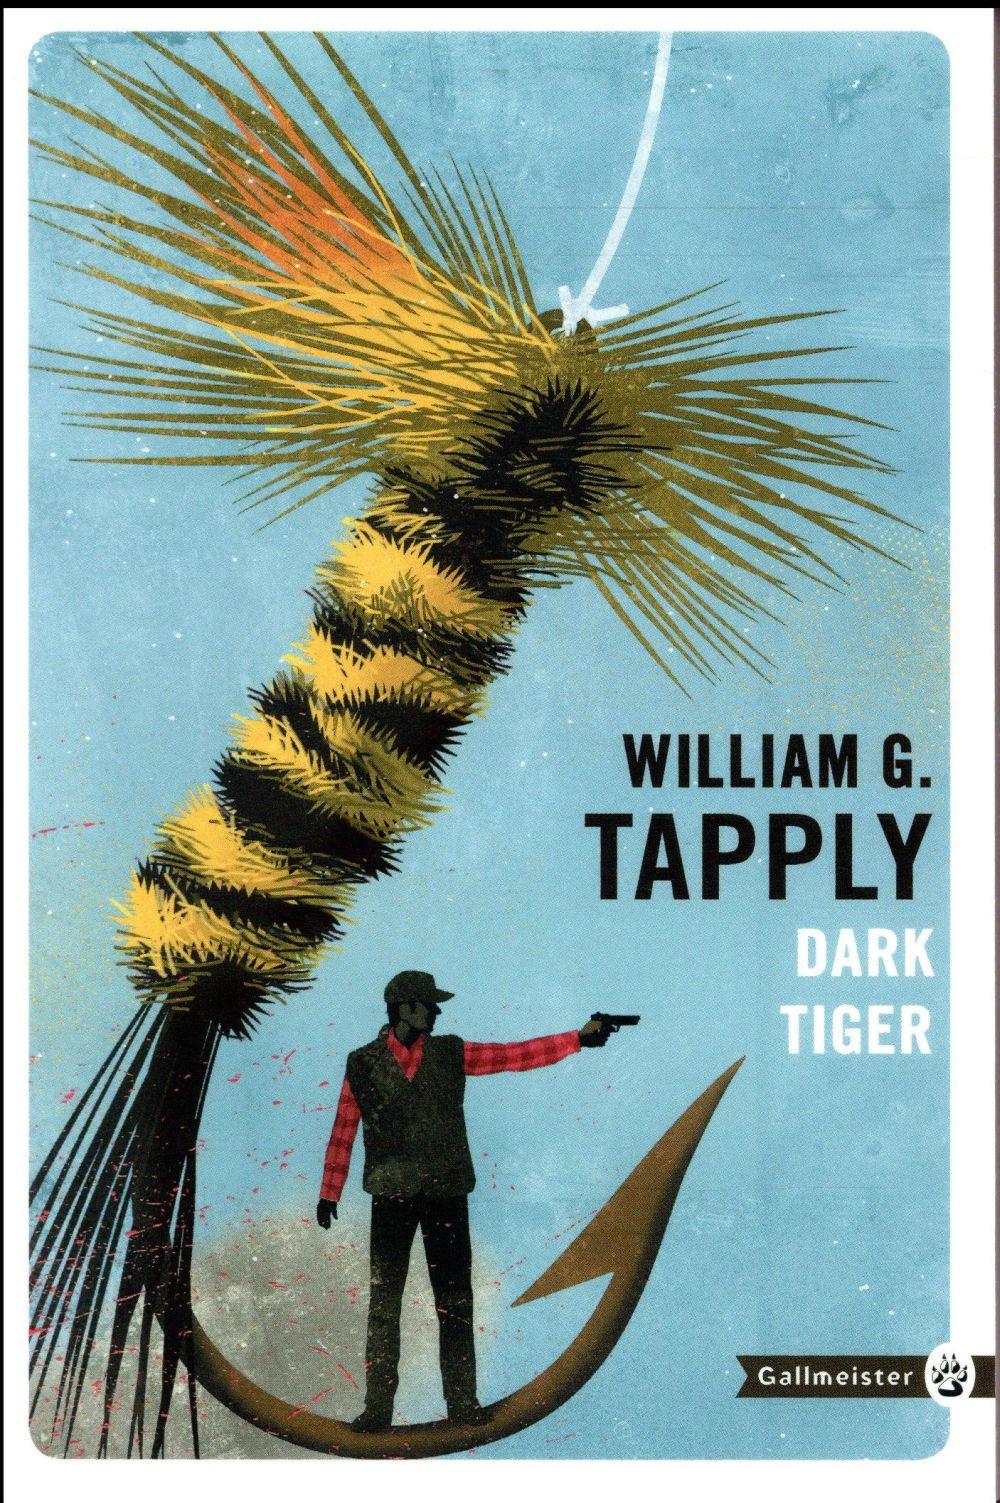 DARK TIGER NED Tapply William G. Gallmeister